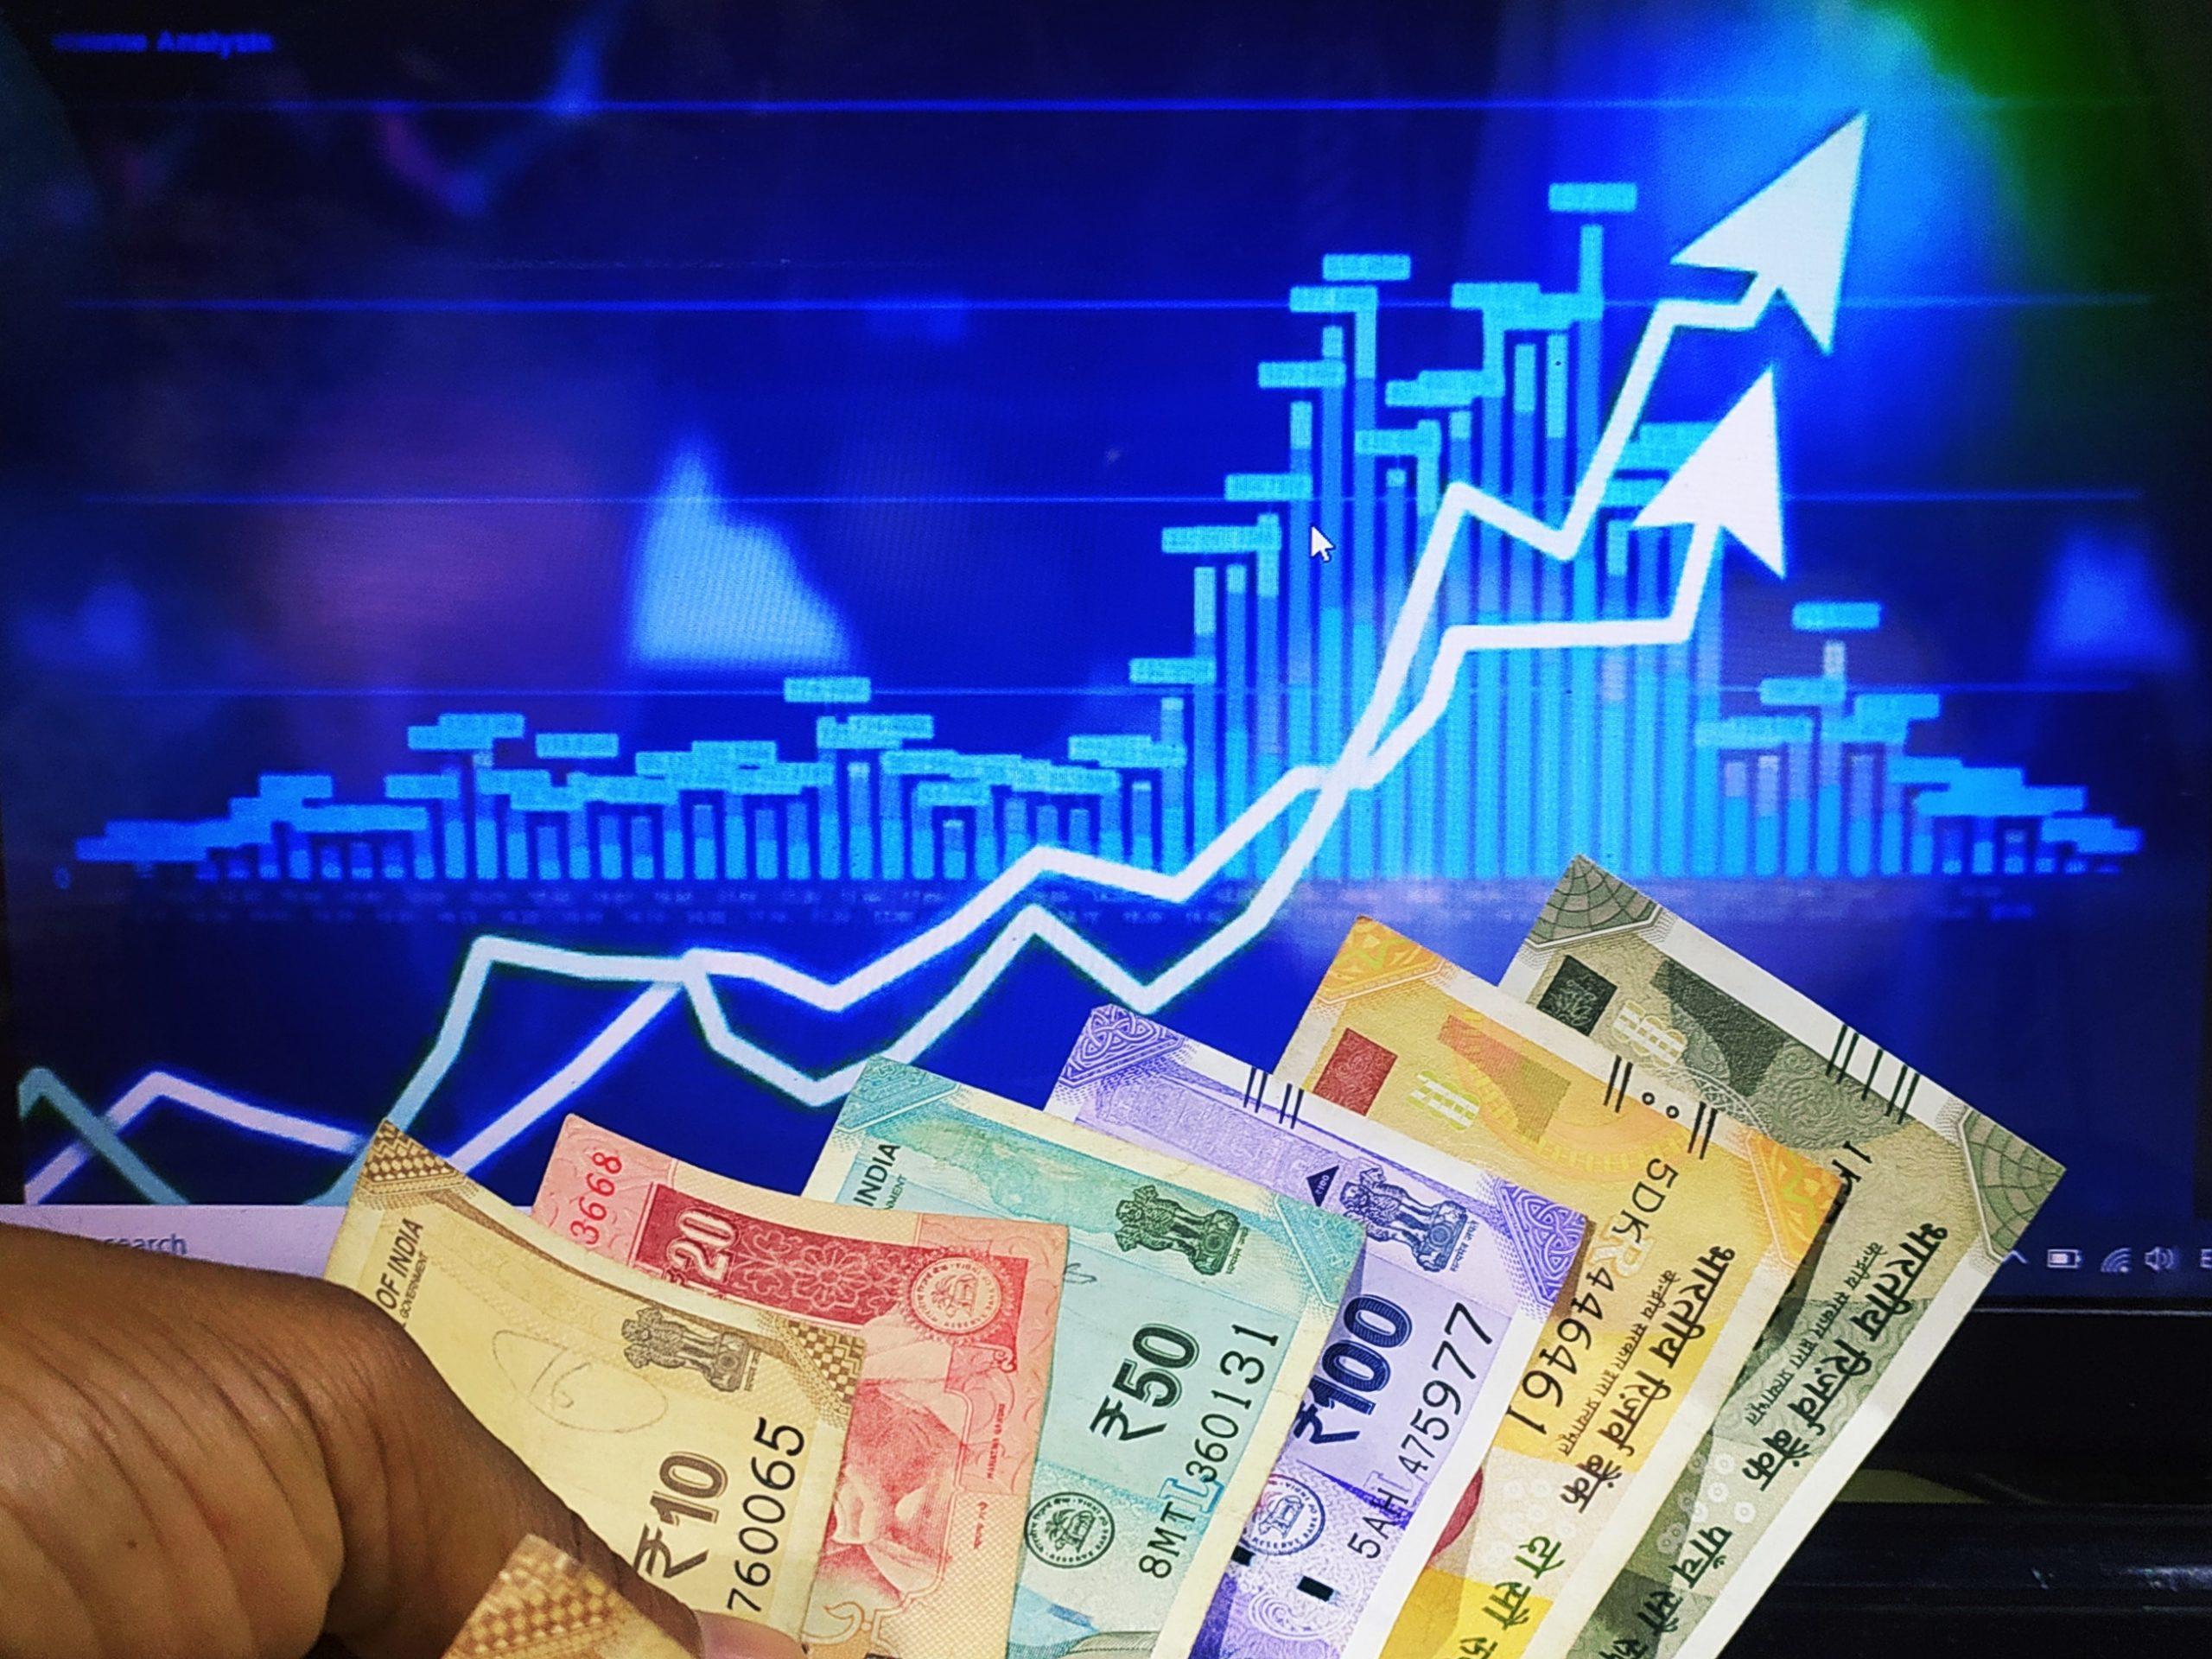 Sensex and stock market